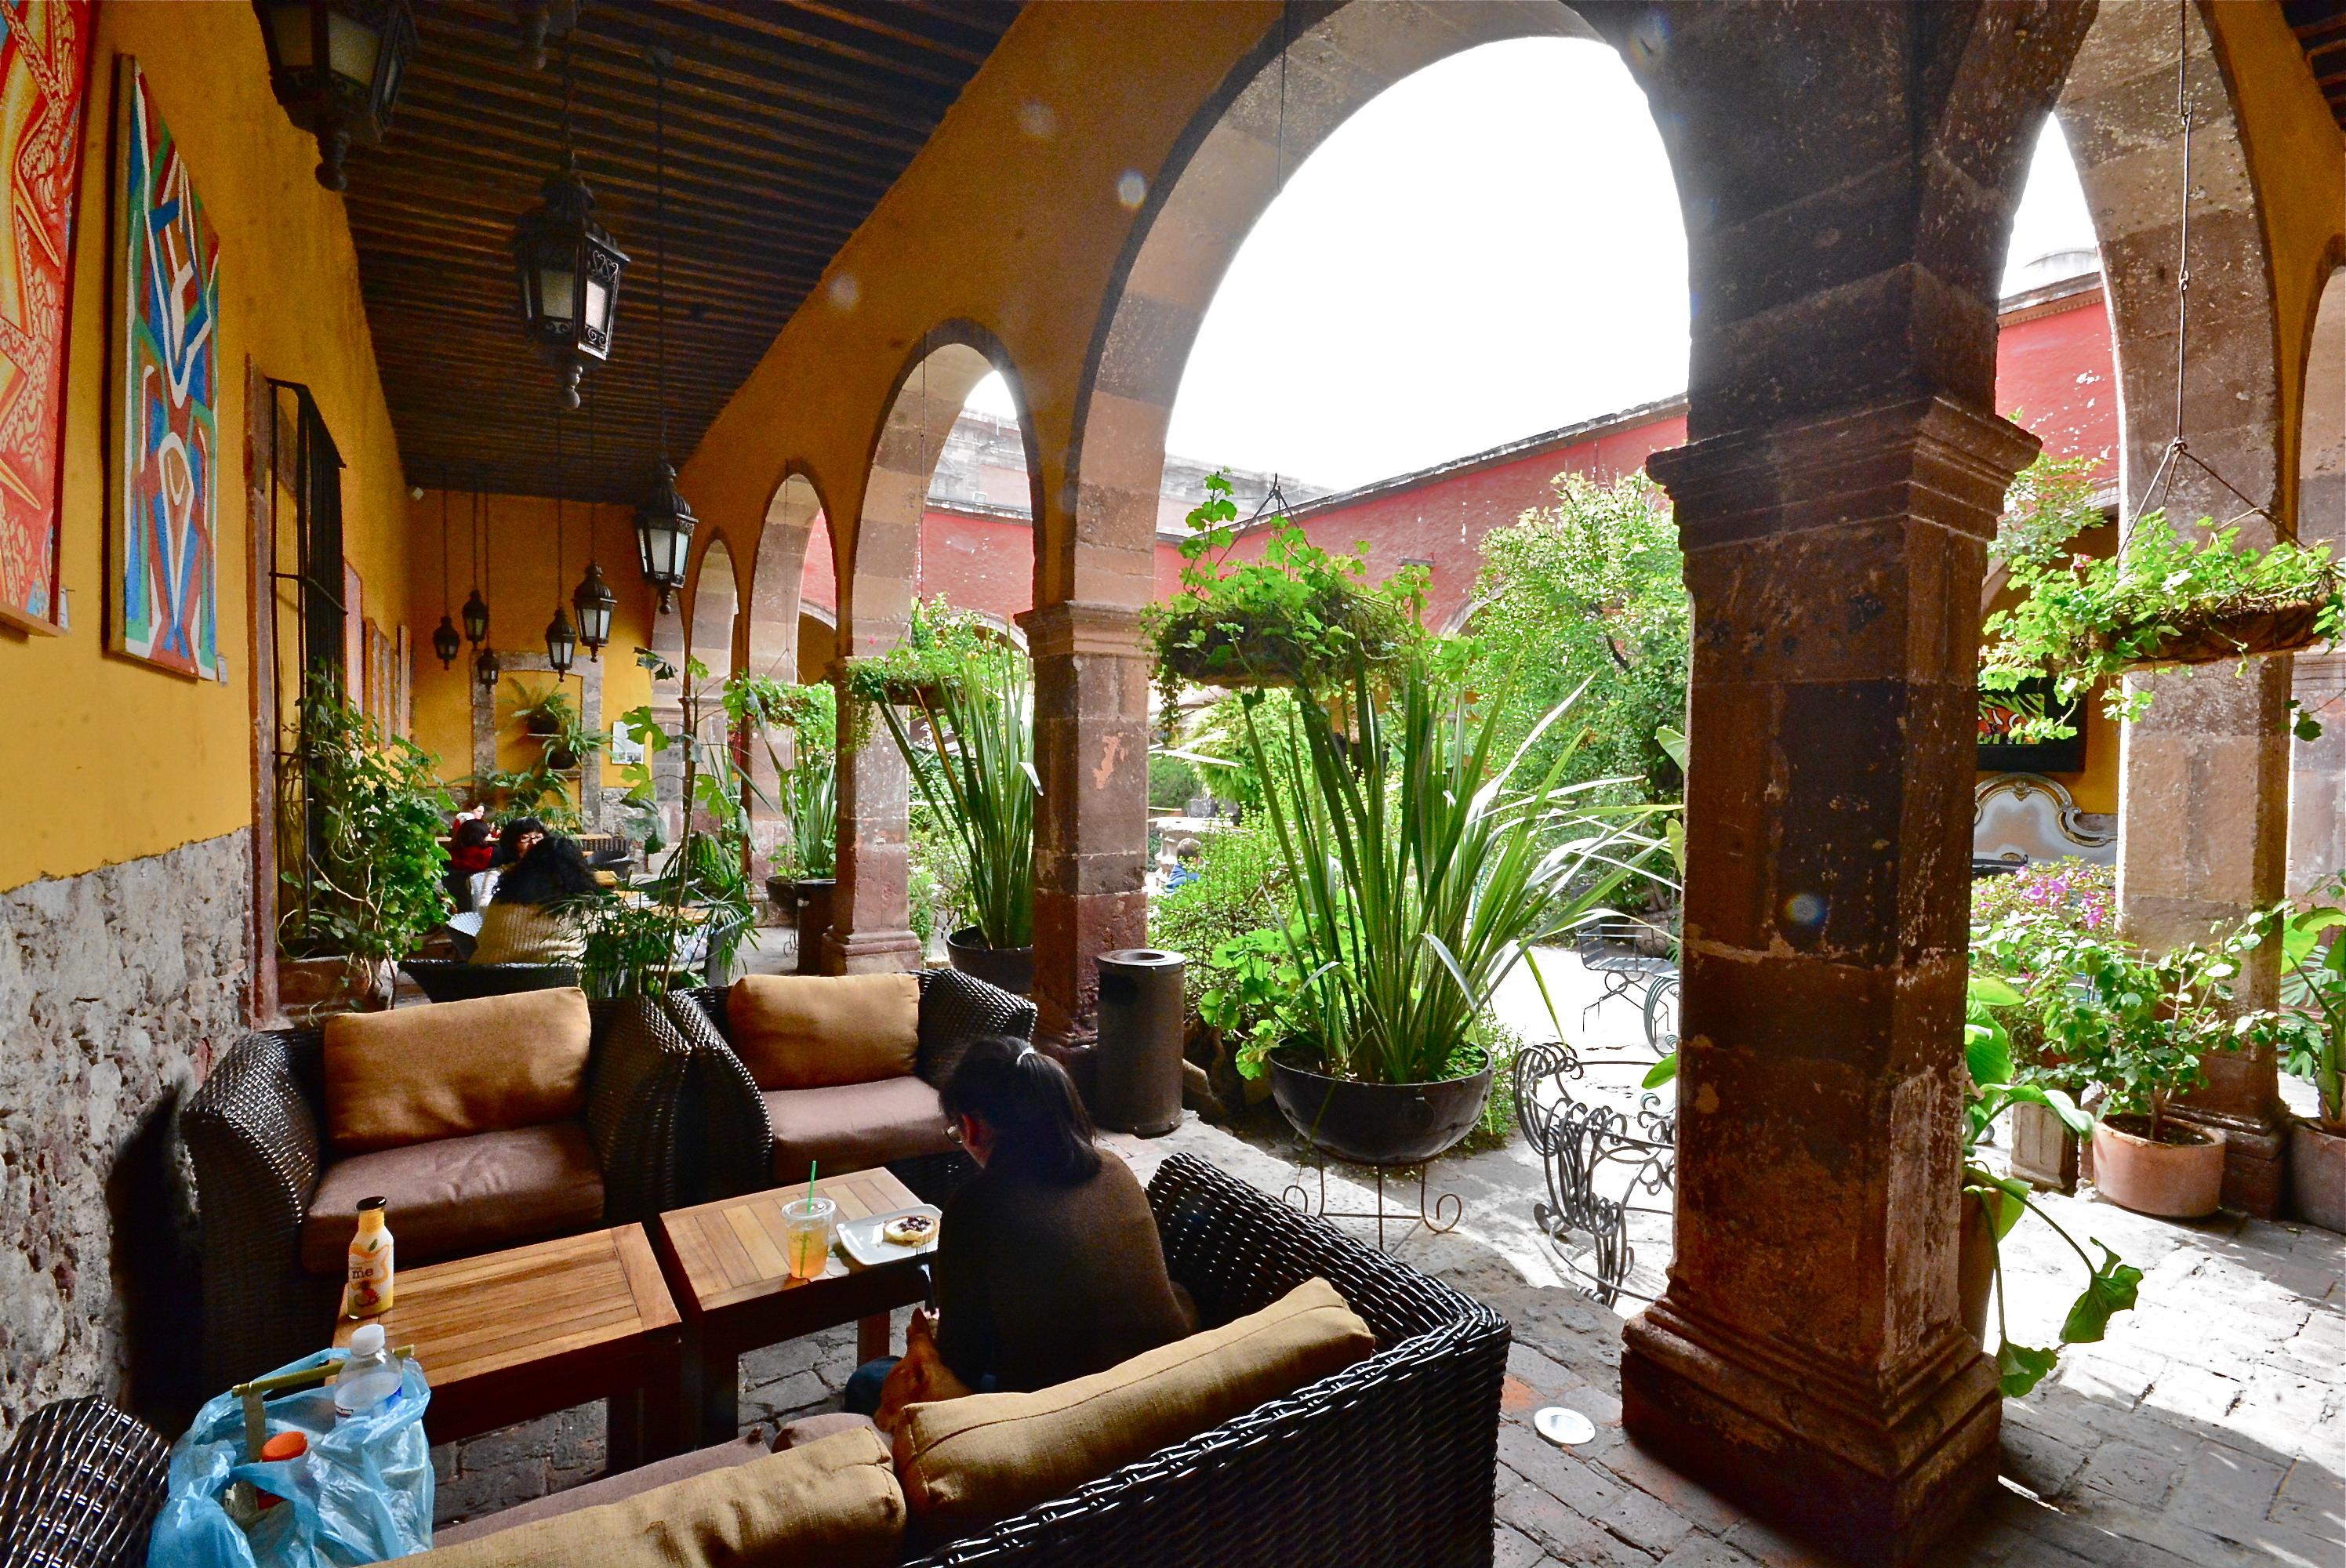 Date Singles In San Miguel De Allende Guanajuato - Meet & Chat Online